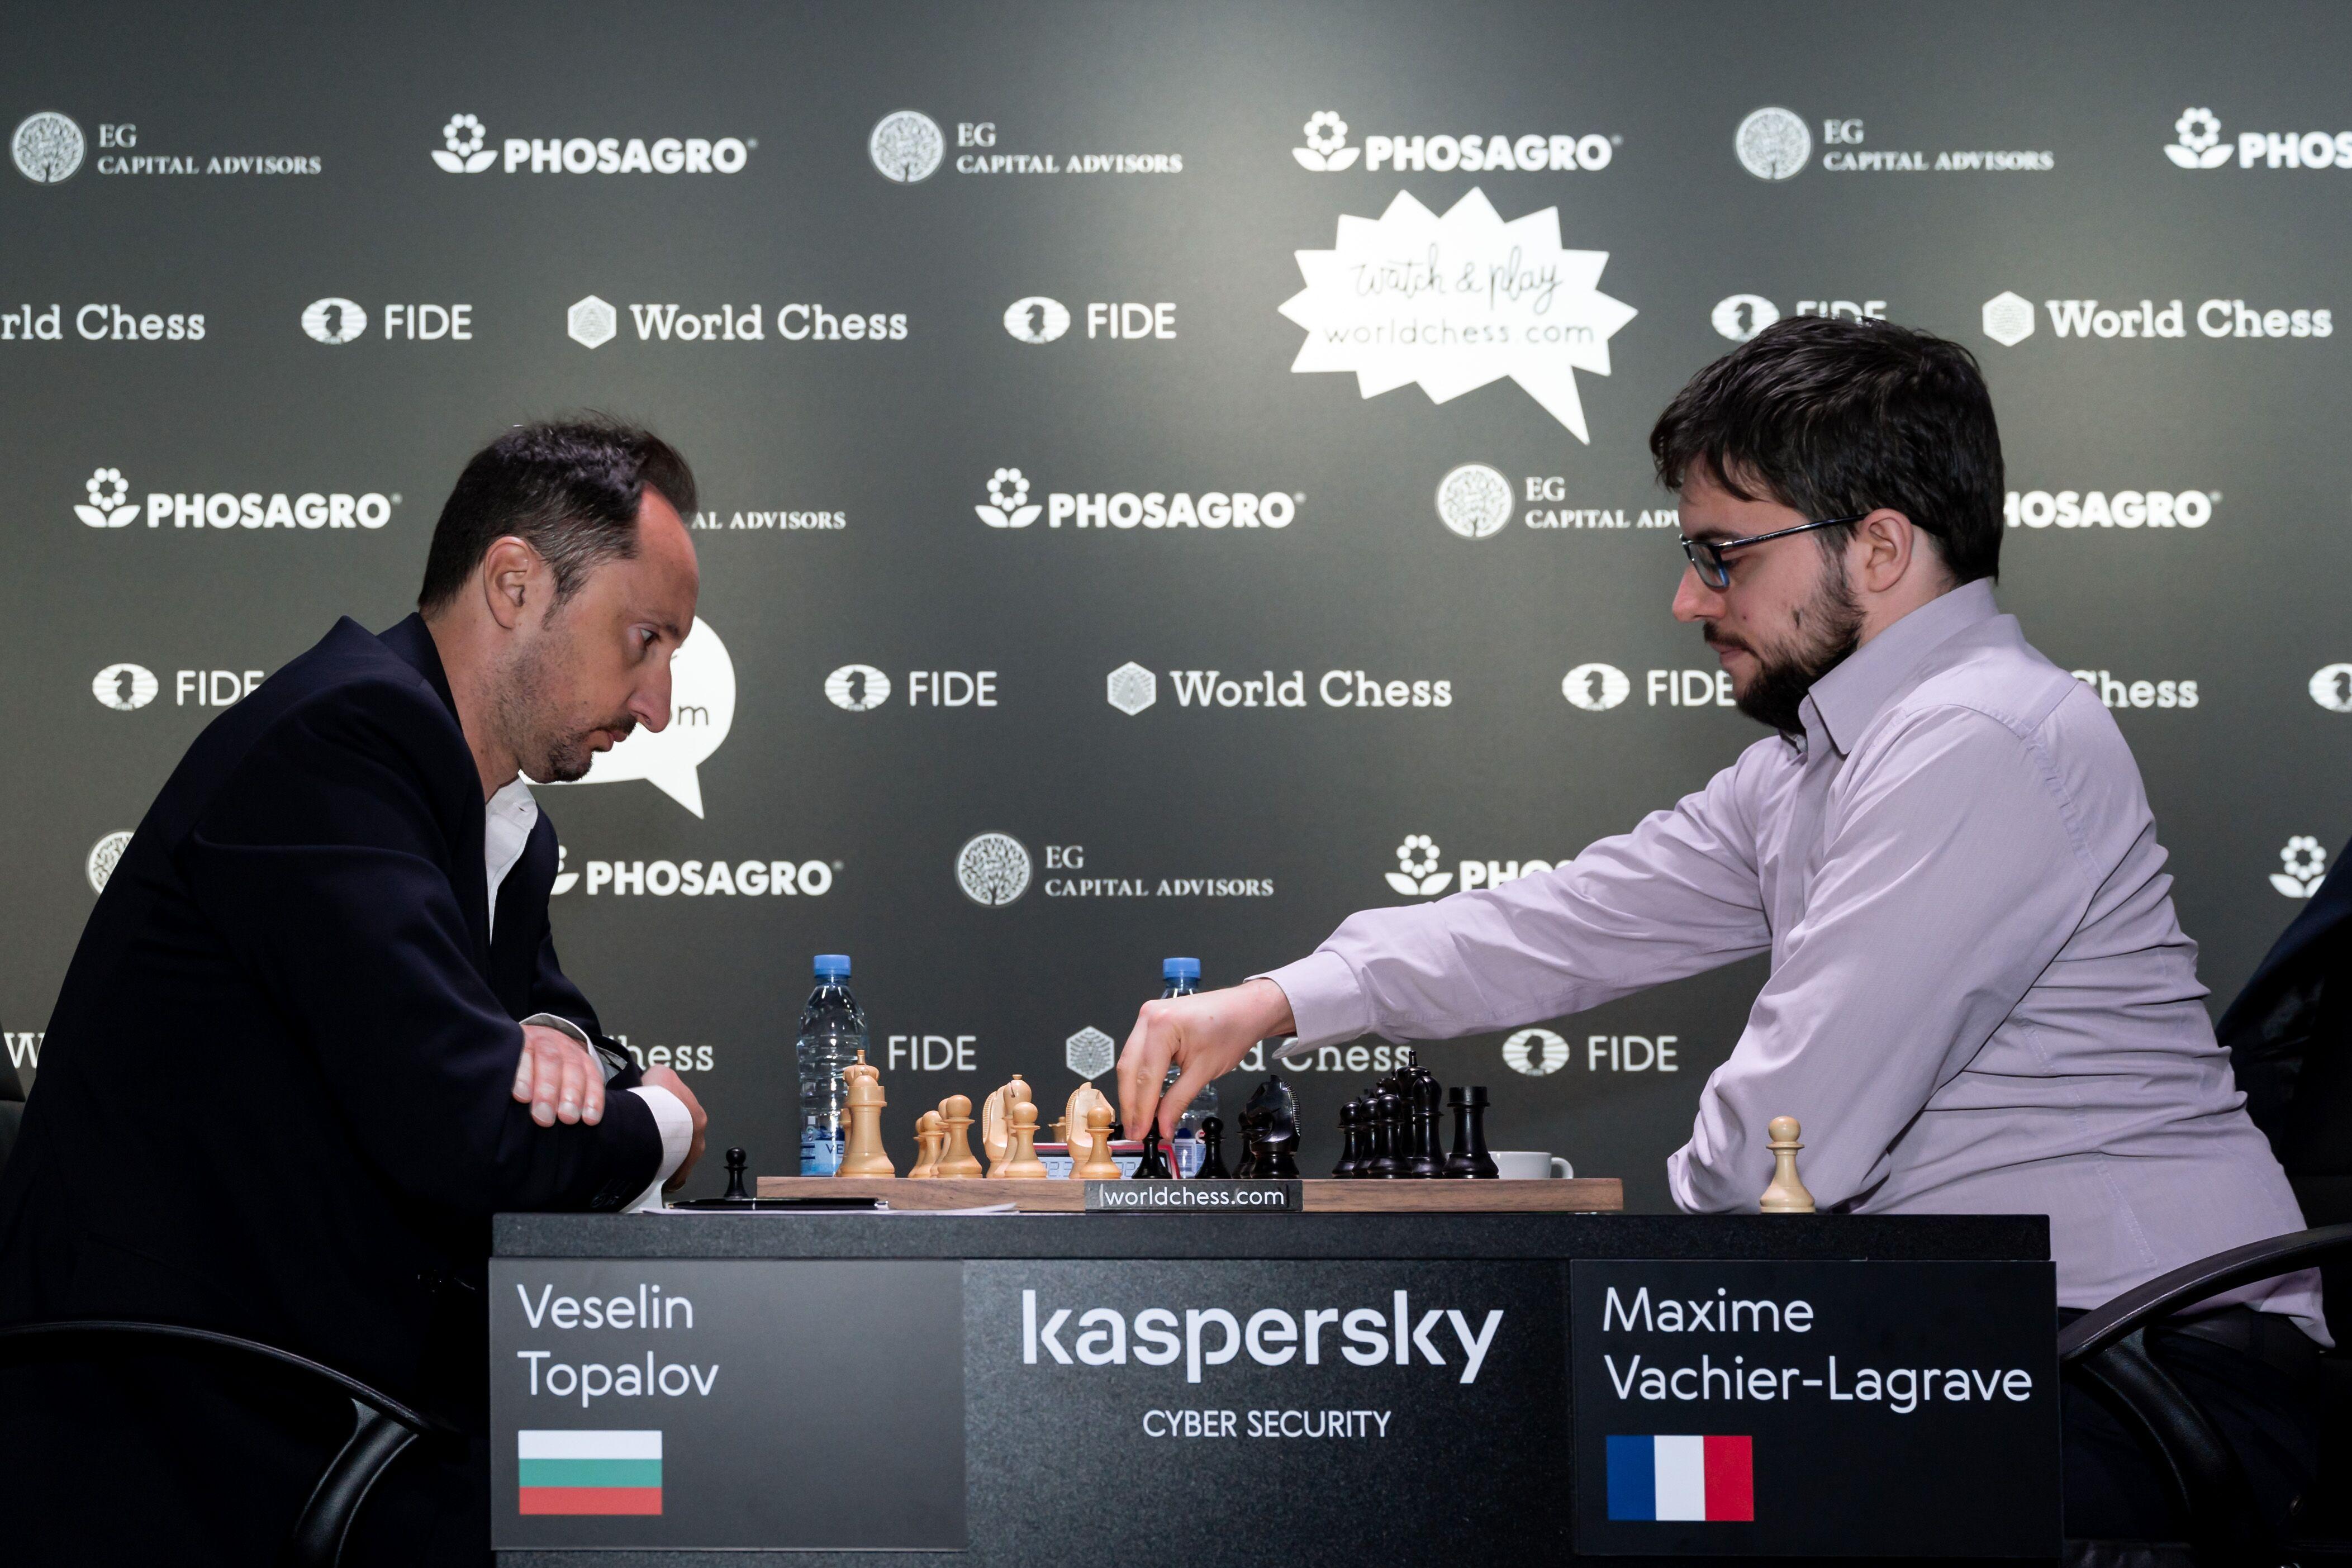 Riga Grand Prix: Vachier-Lagrave Only Winner Round 2, Day 1